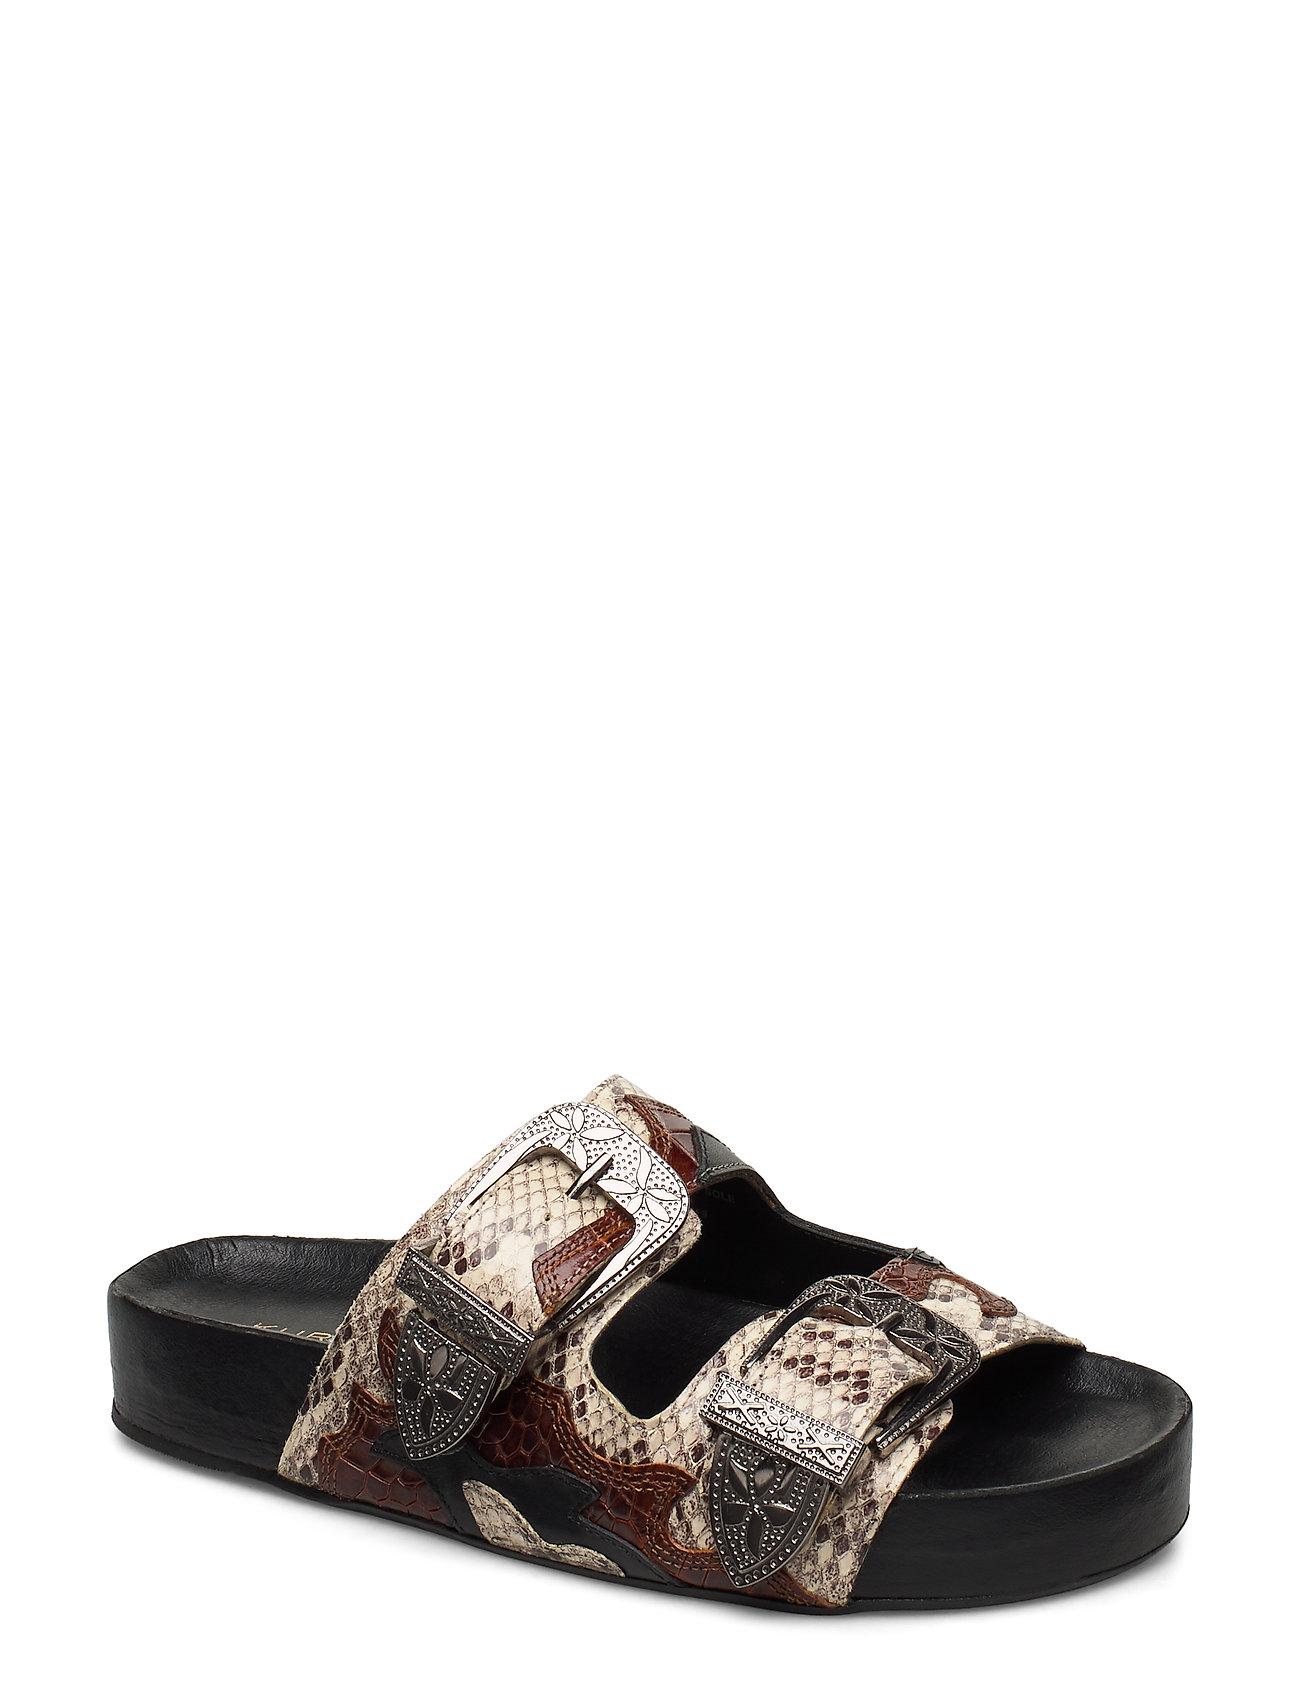 Image of Dellis Shoes Summer Shoes Flat Sandals Brun Kurt Geiger London (3329983607)